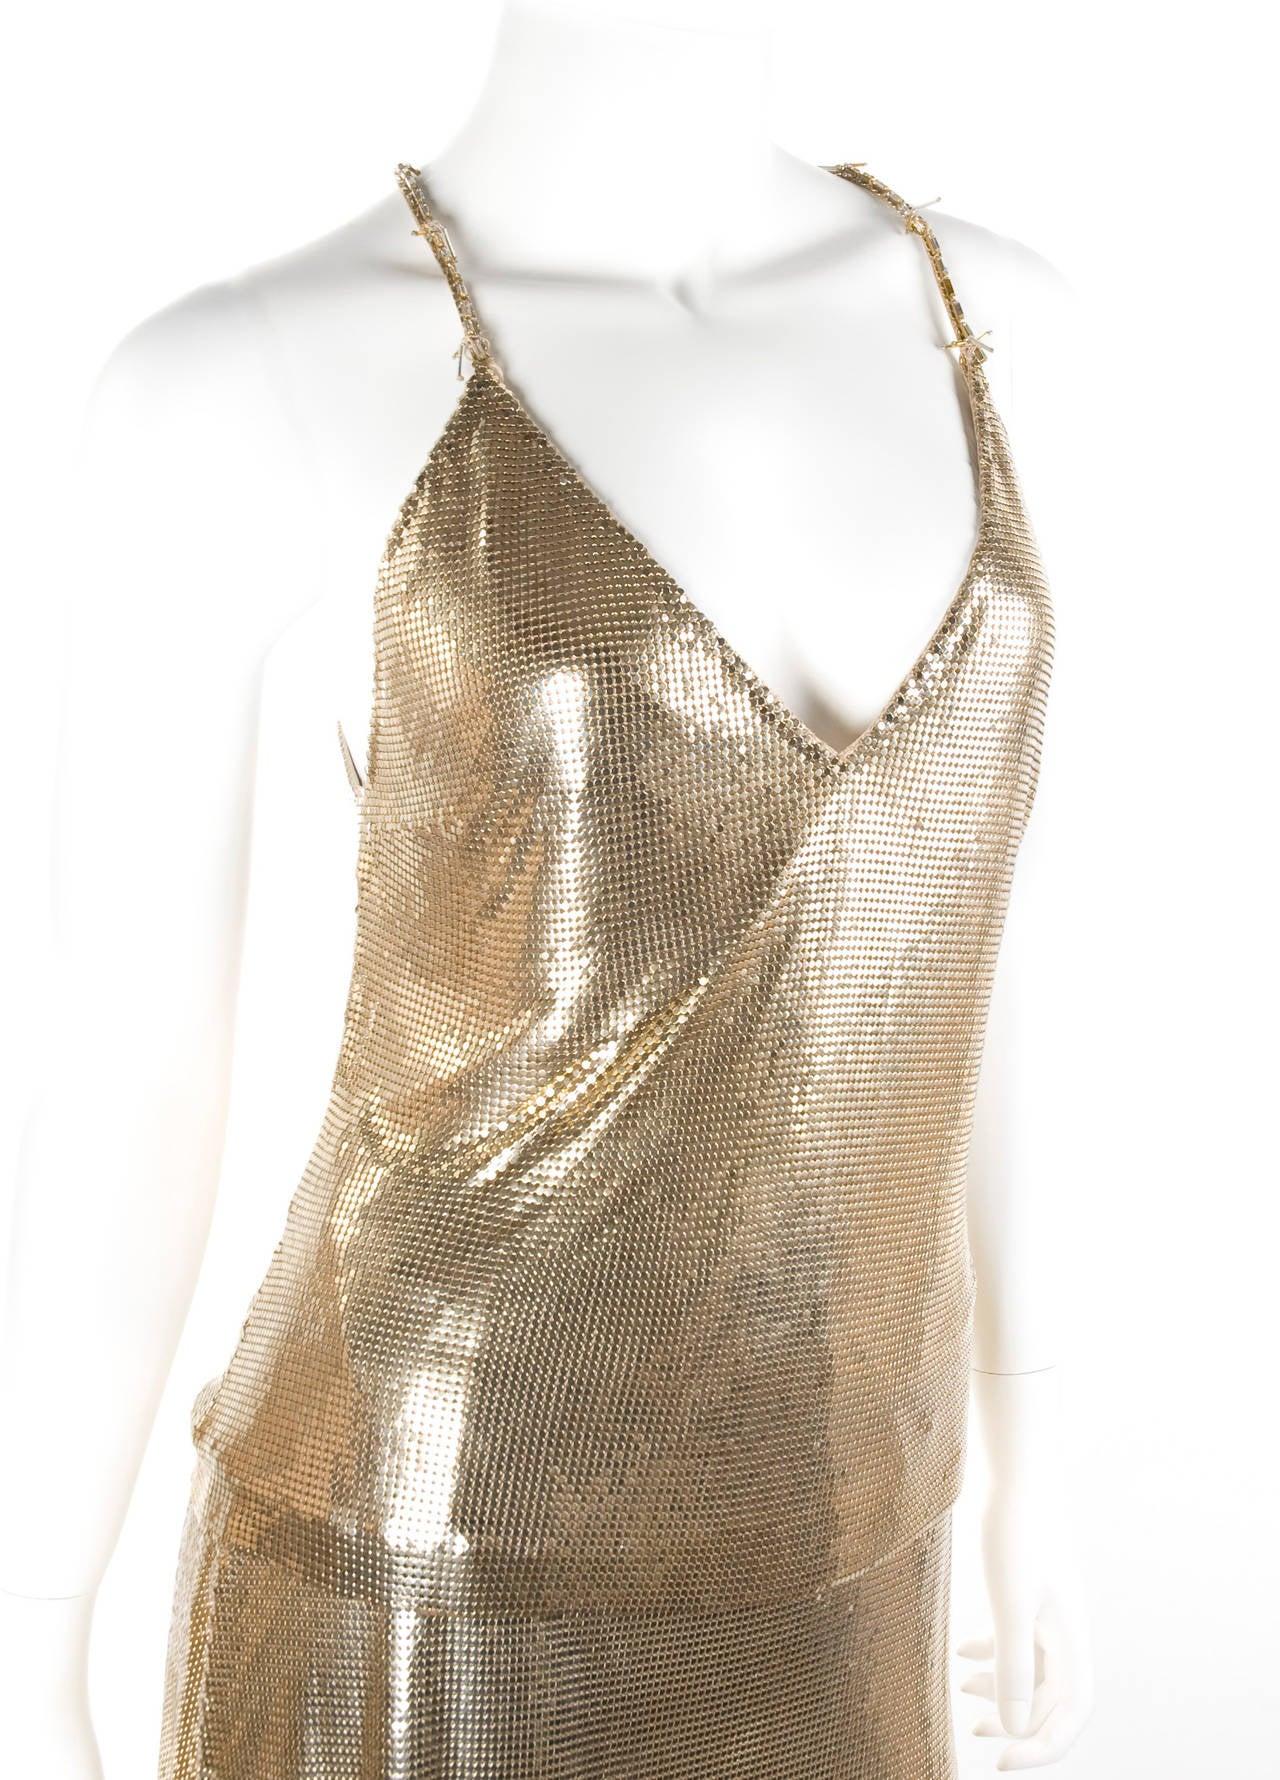 1982 Gianni Versace Couture Metal Mesh Oroton Top and Skirt 4